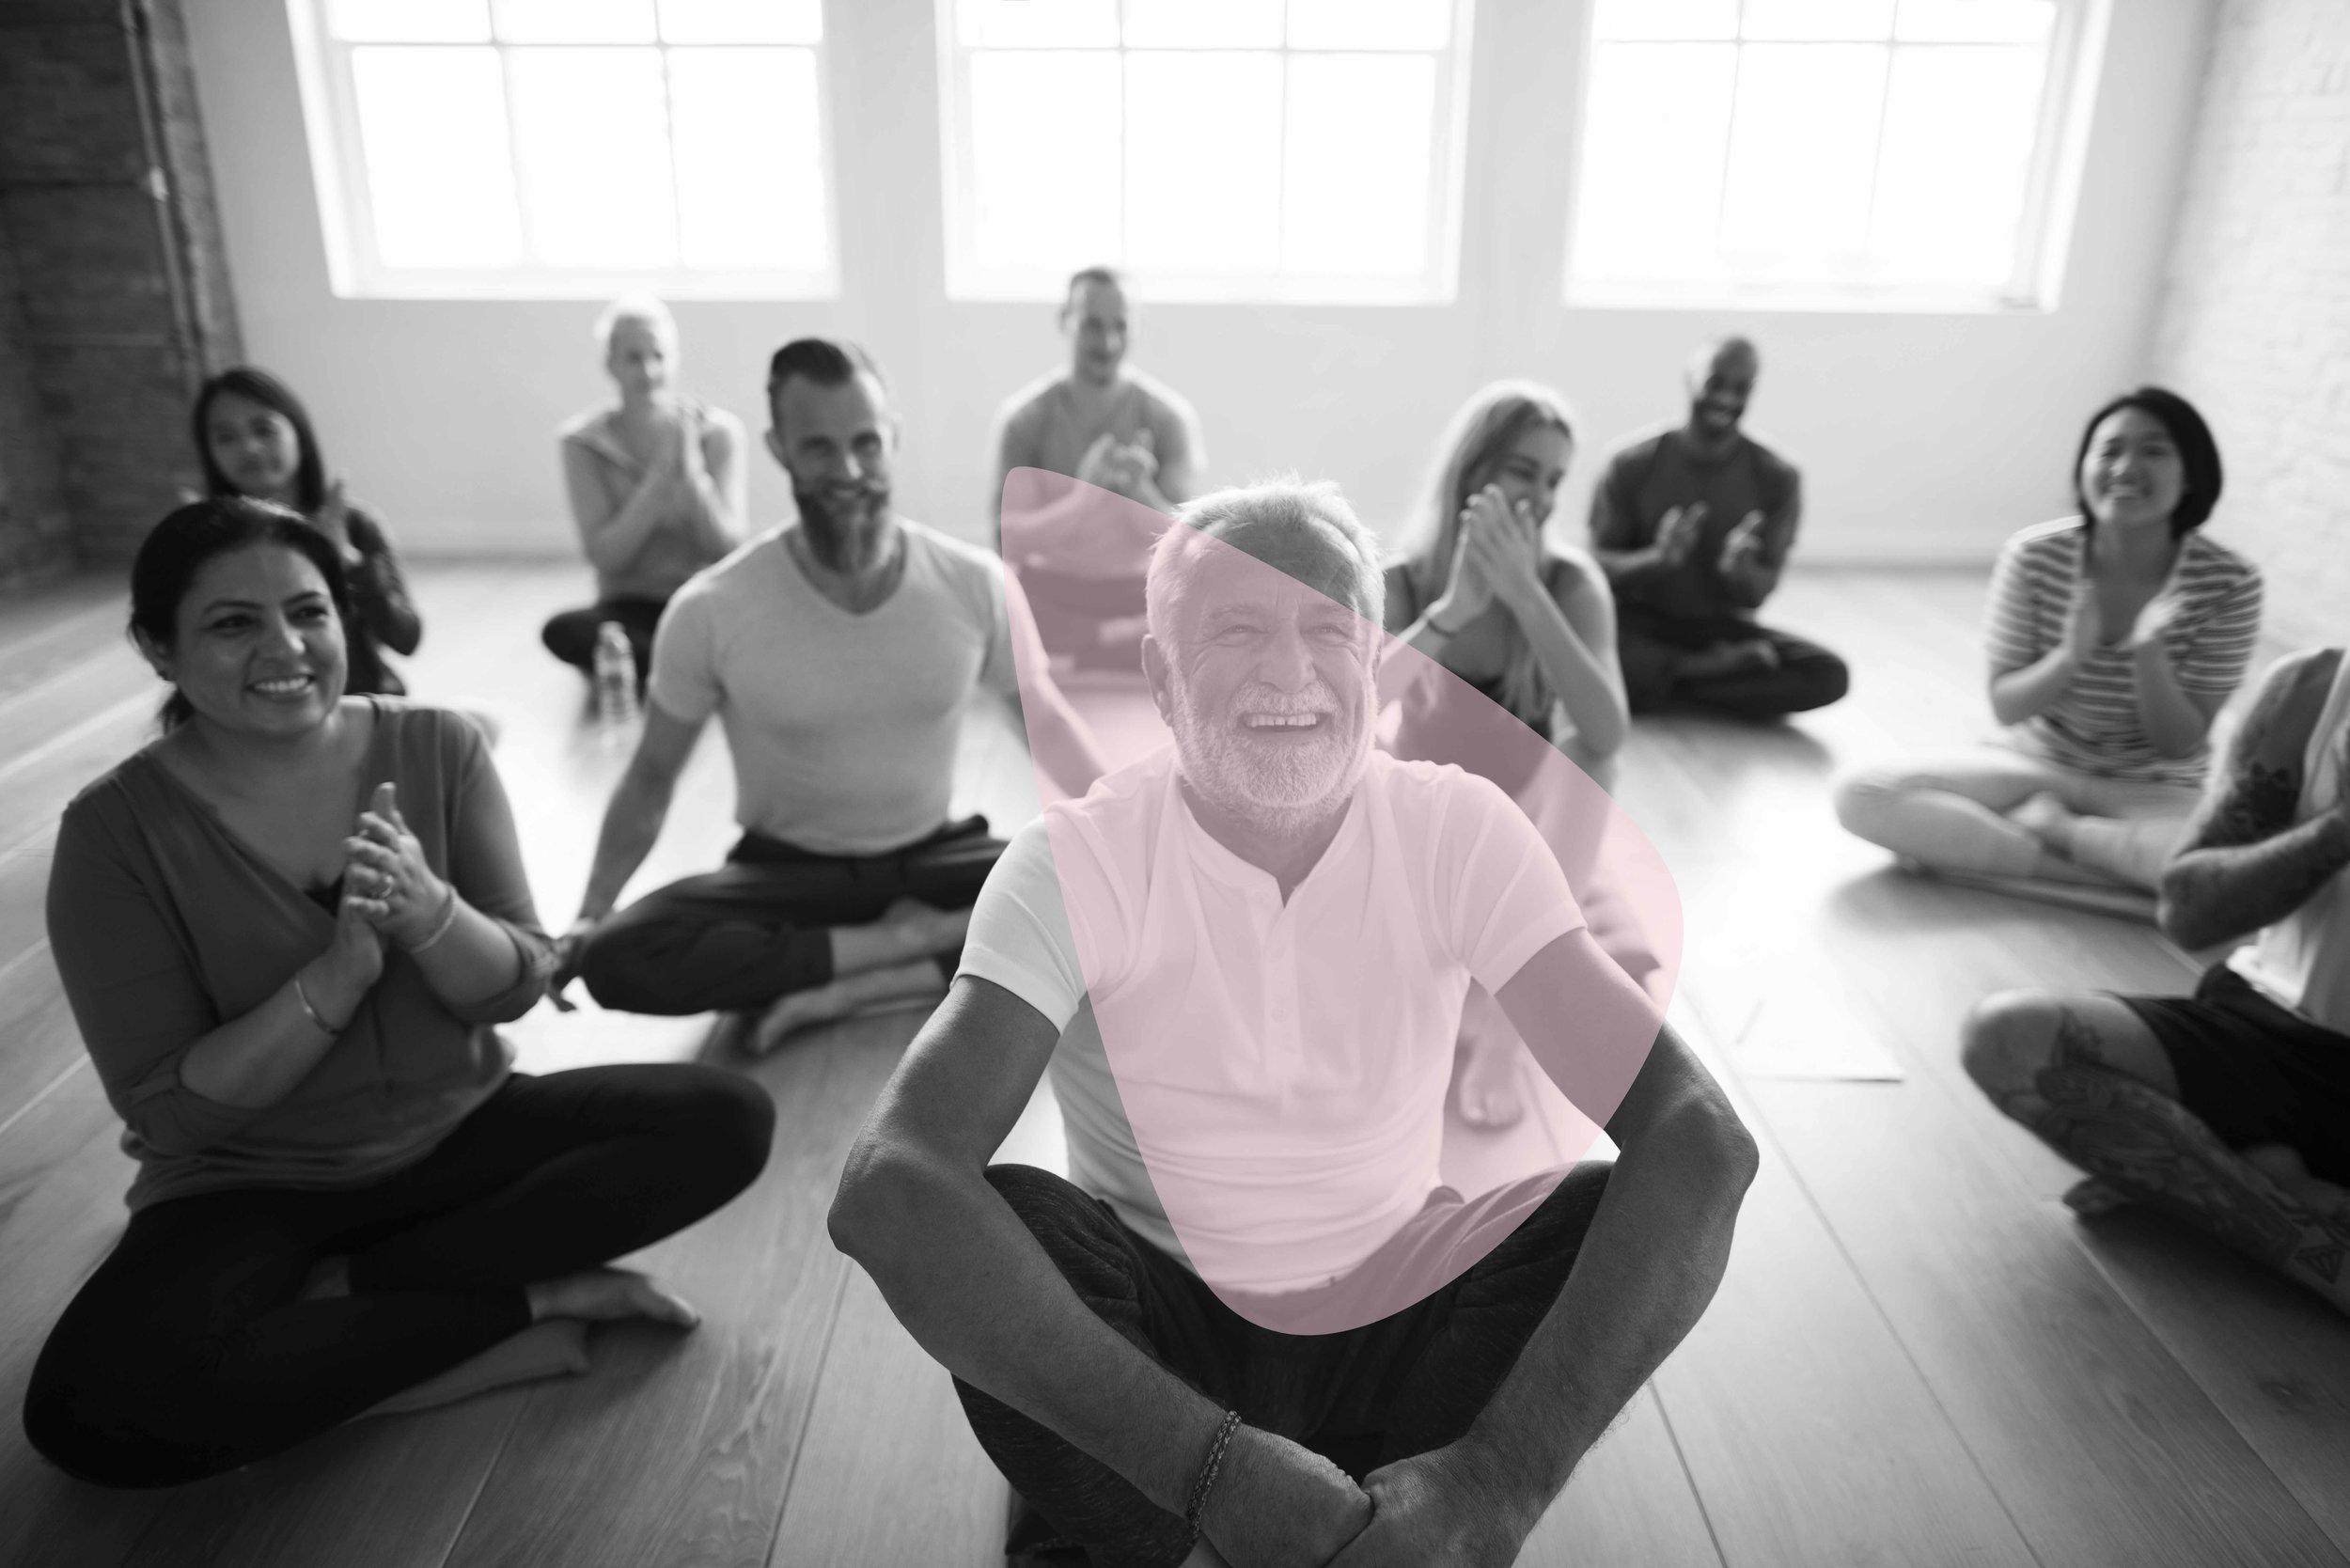 Mixed Yogis Having Fun at a Yoga Class